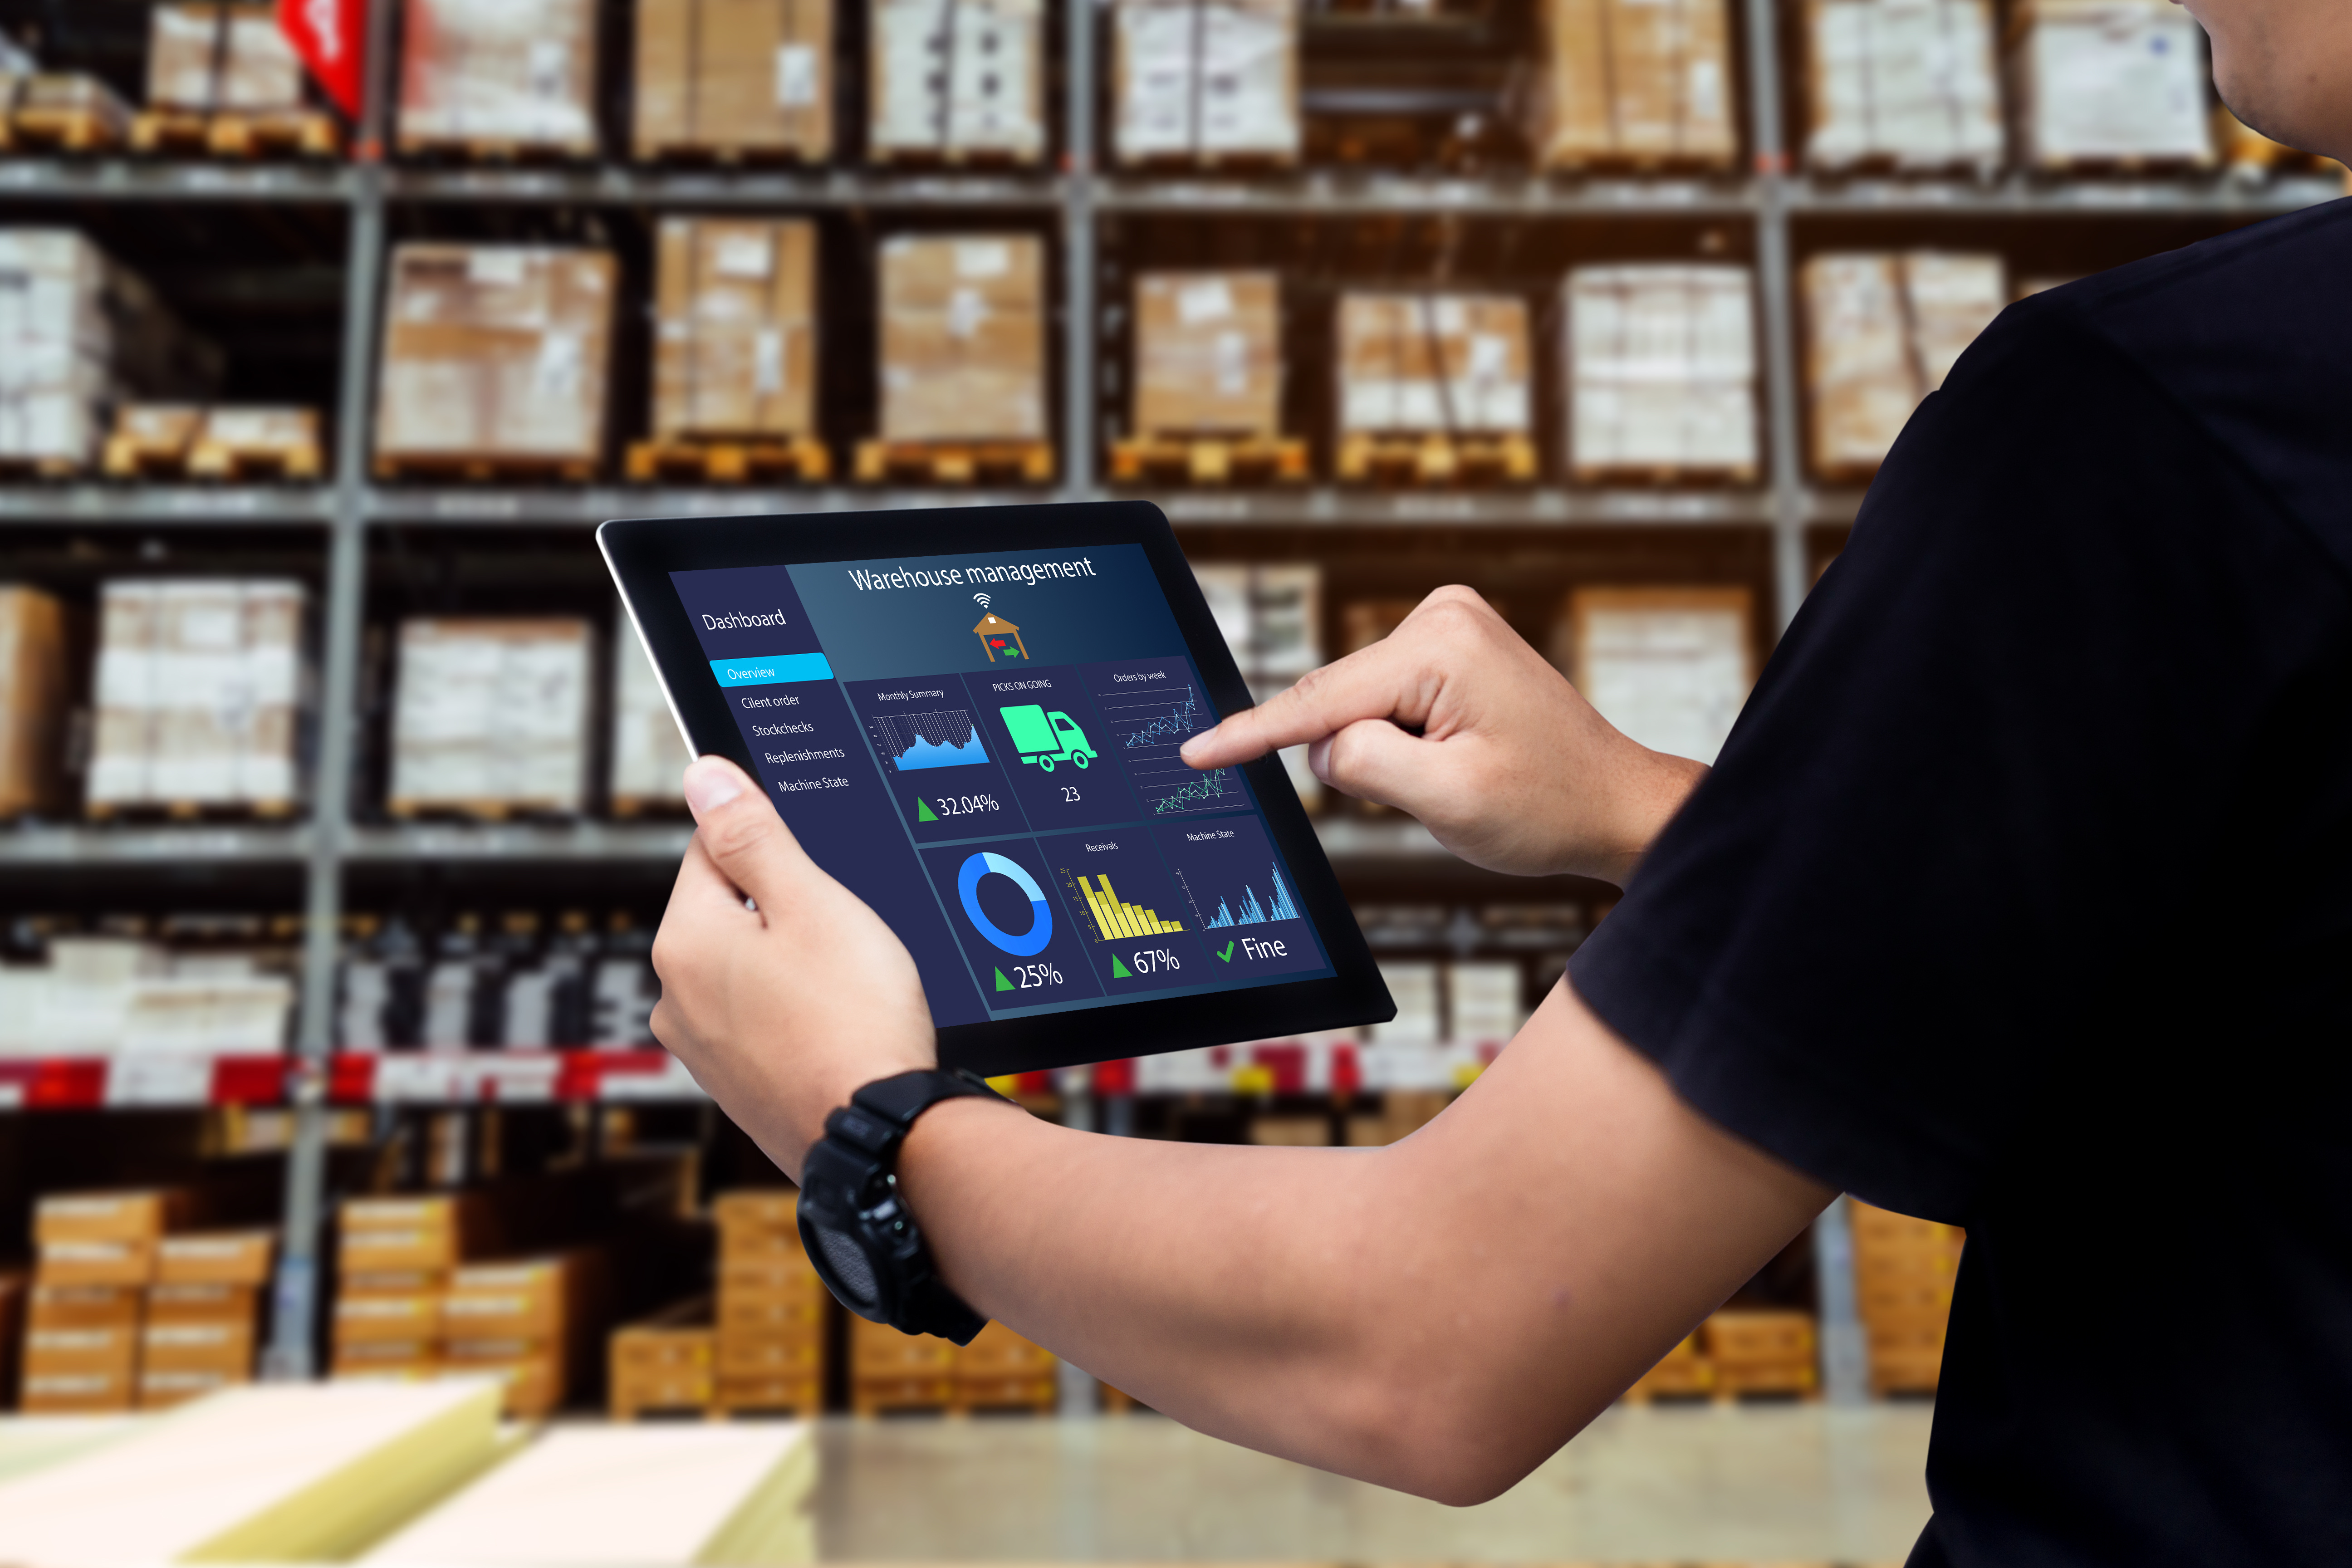 man monitoring warehouse inventory on an ipad